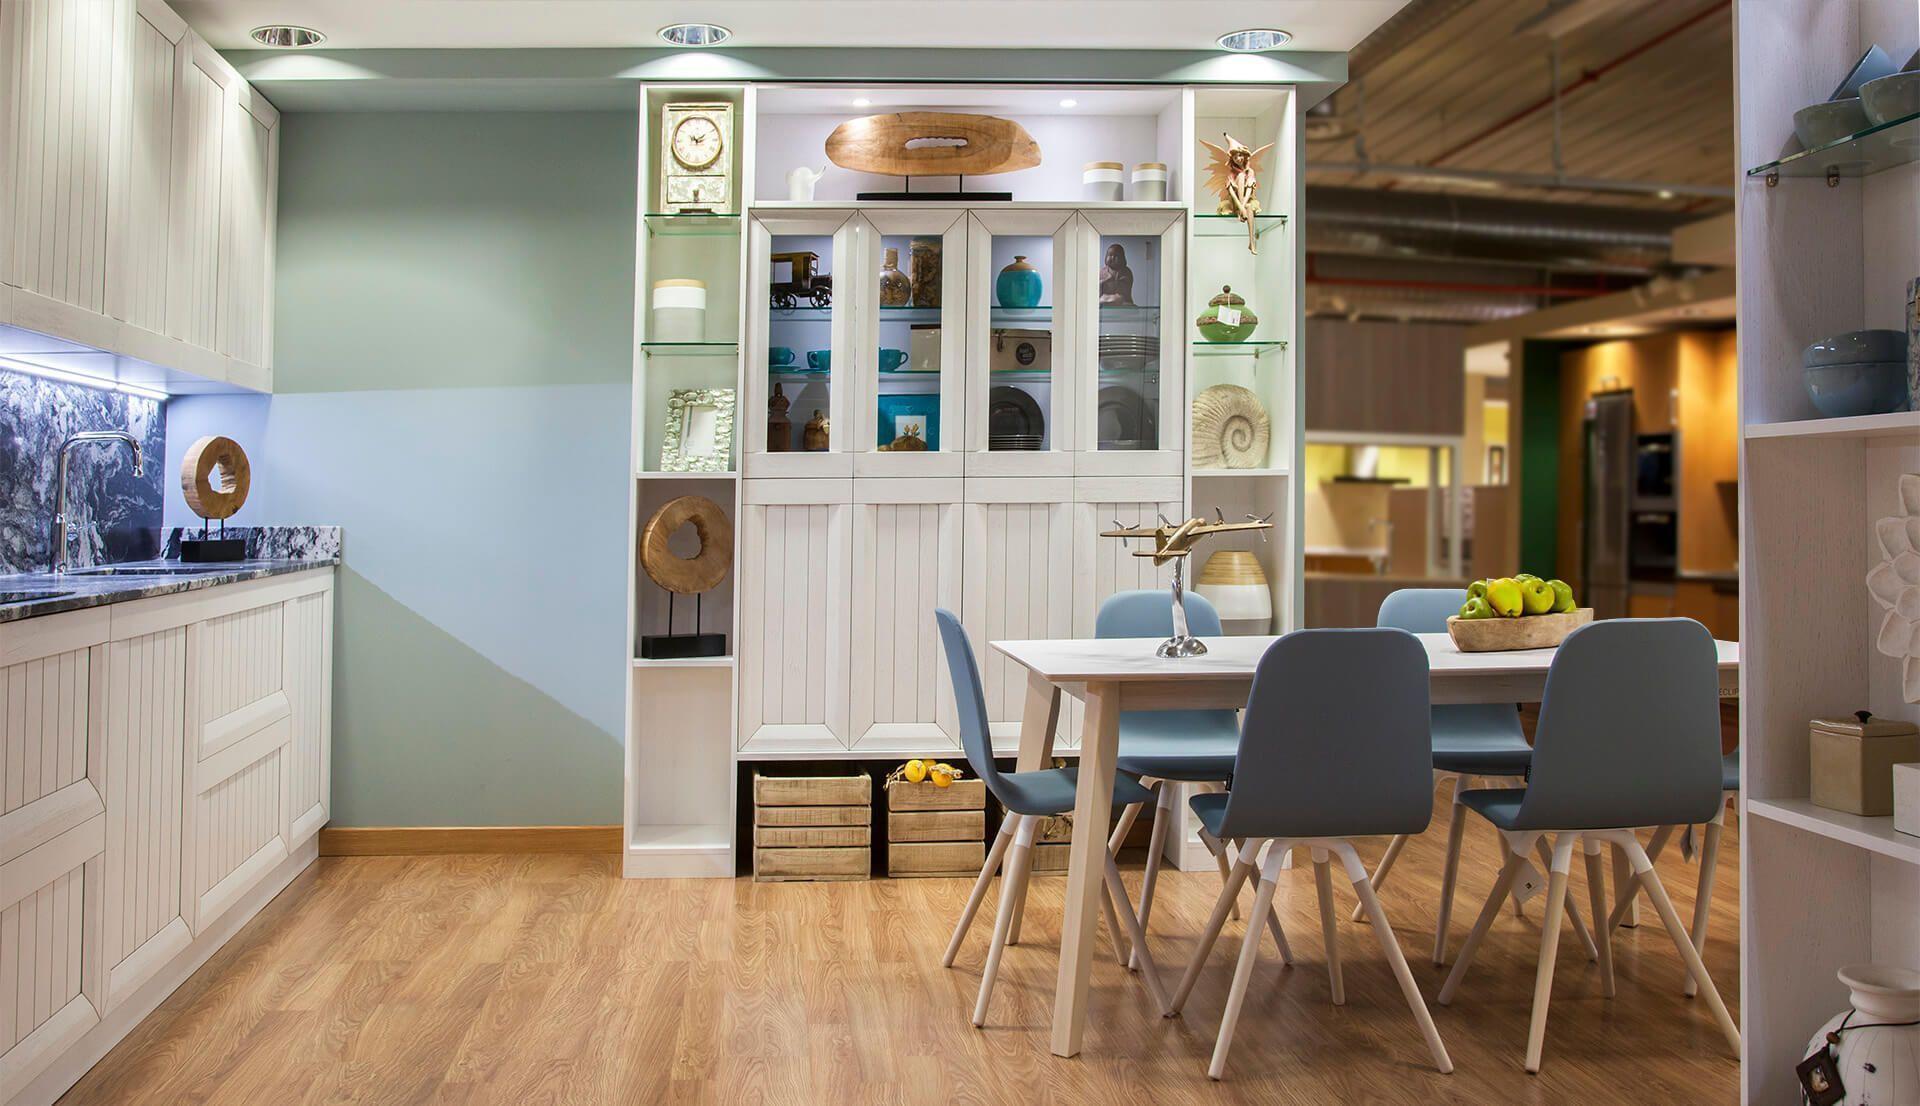 Muebles anser cool amazing muebles de cocina a medida - Muebles por internet espana ...